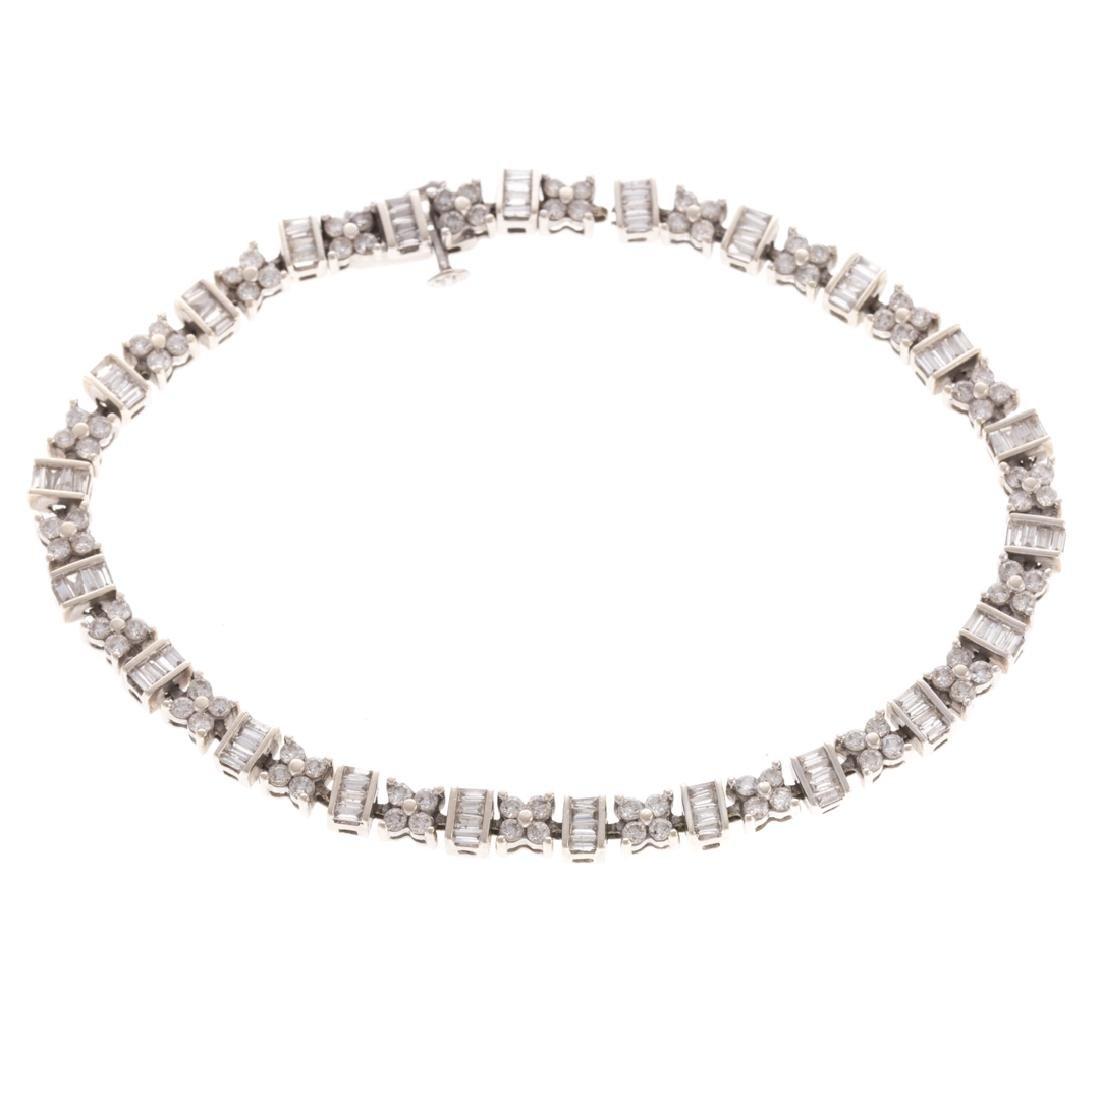 A Lady's Classic 14K Diamond Line Bracelet - 4